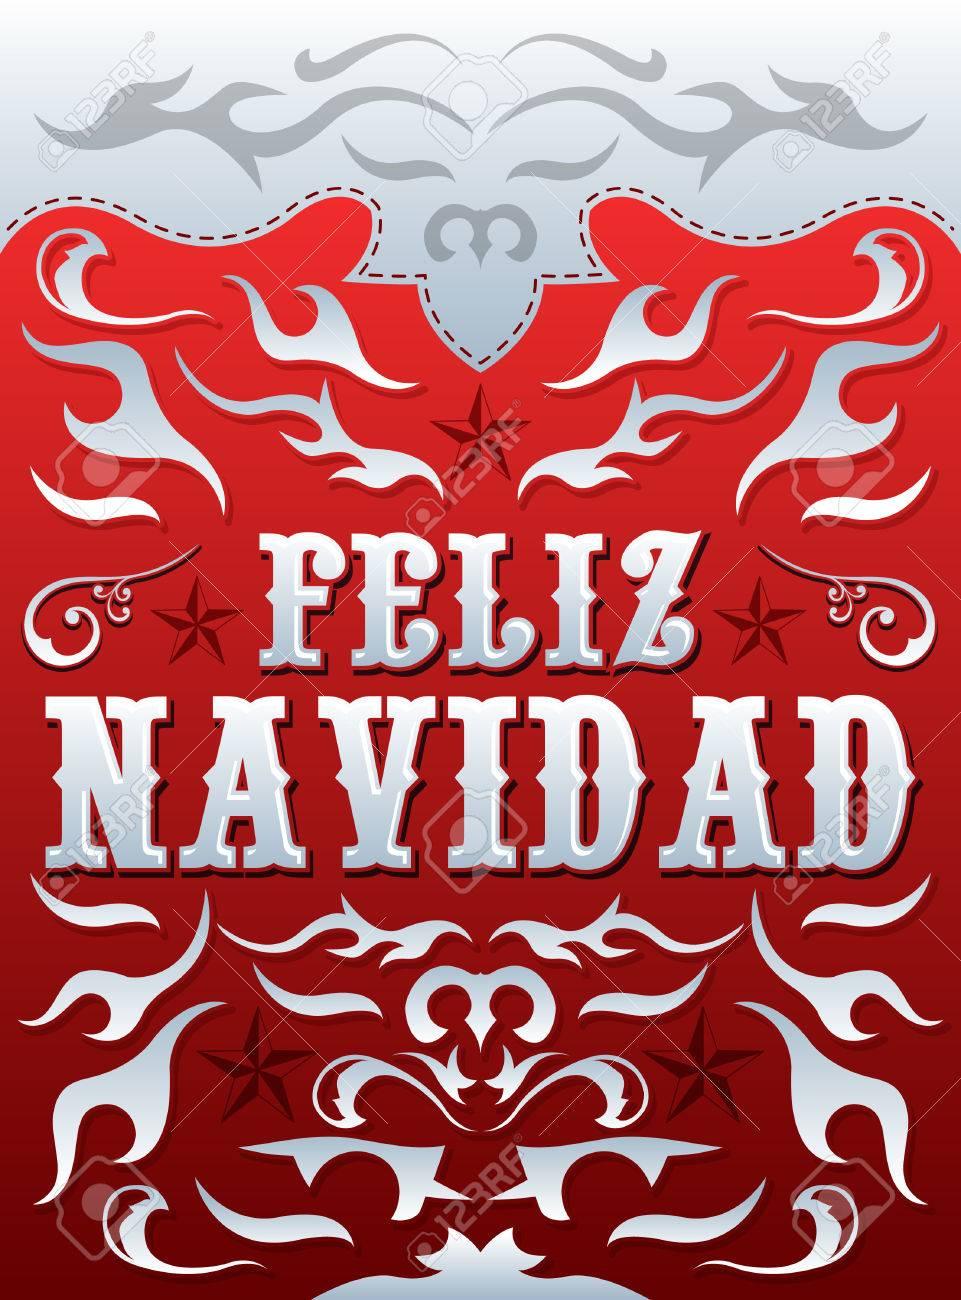 feliz navidad merry christmas spanish text vector card feliz navidad merry christmas spanish text vector card poster template western style